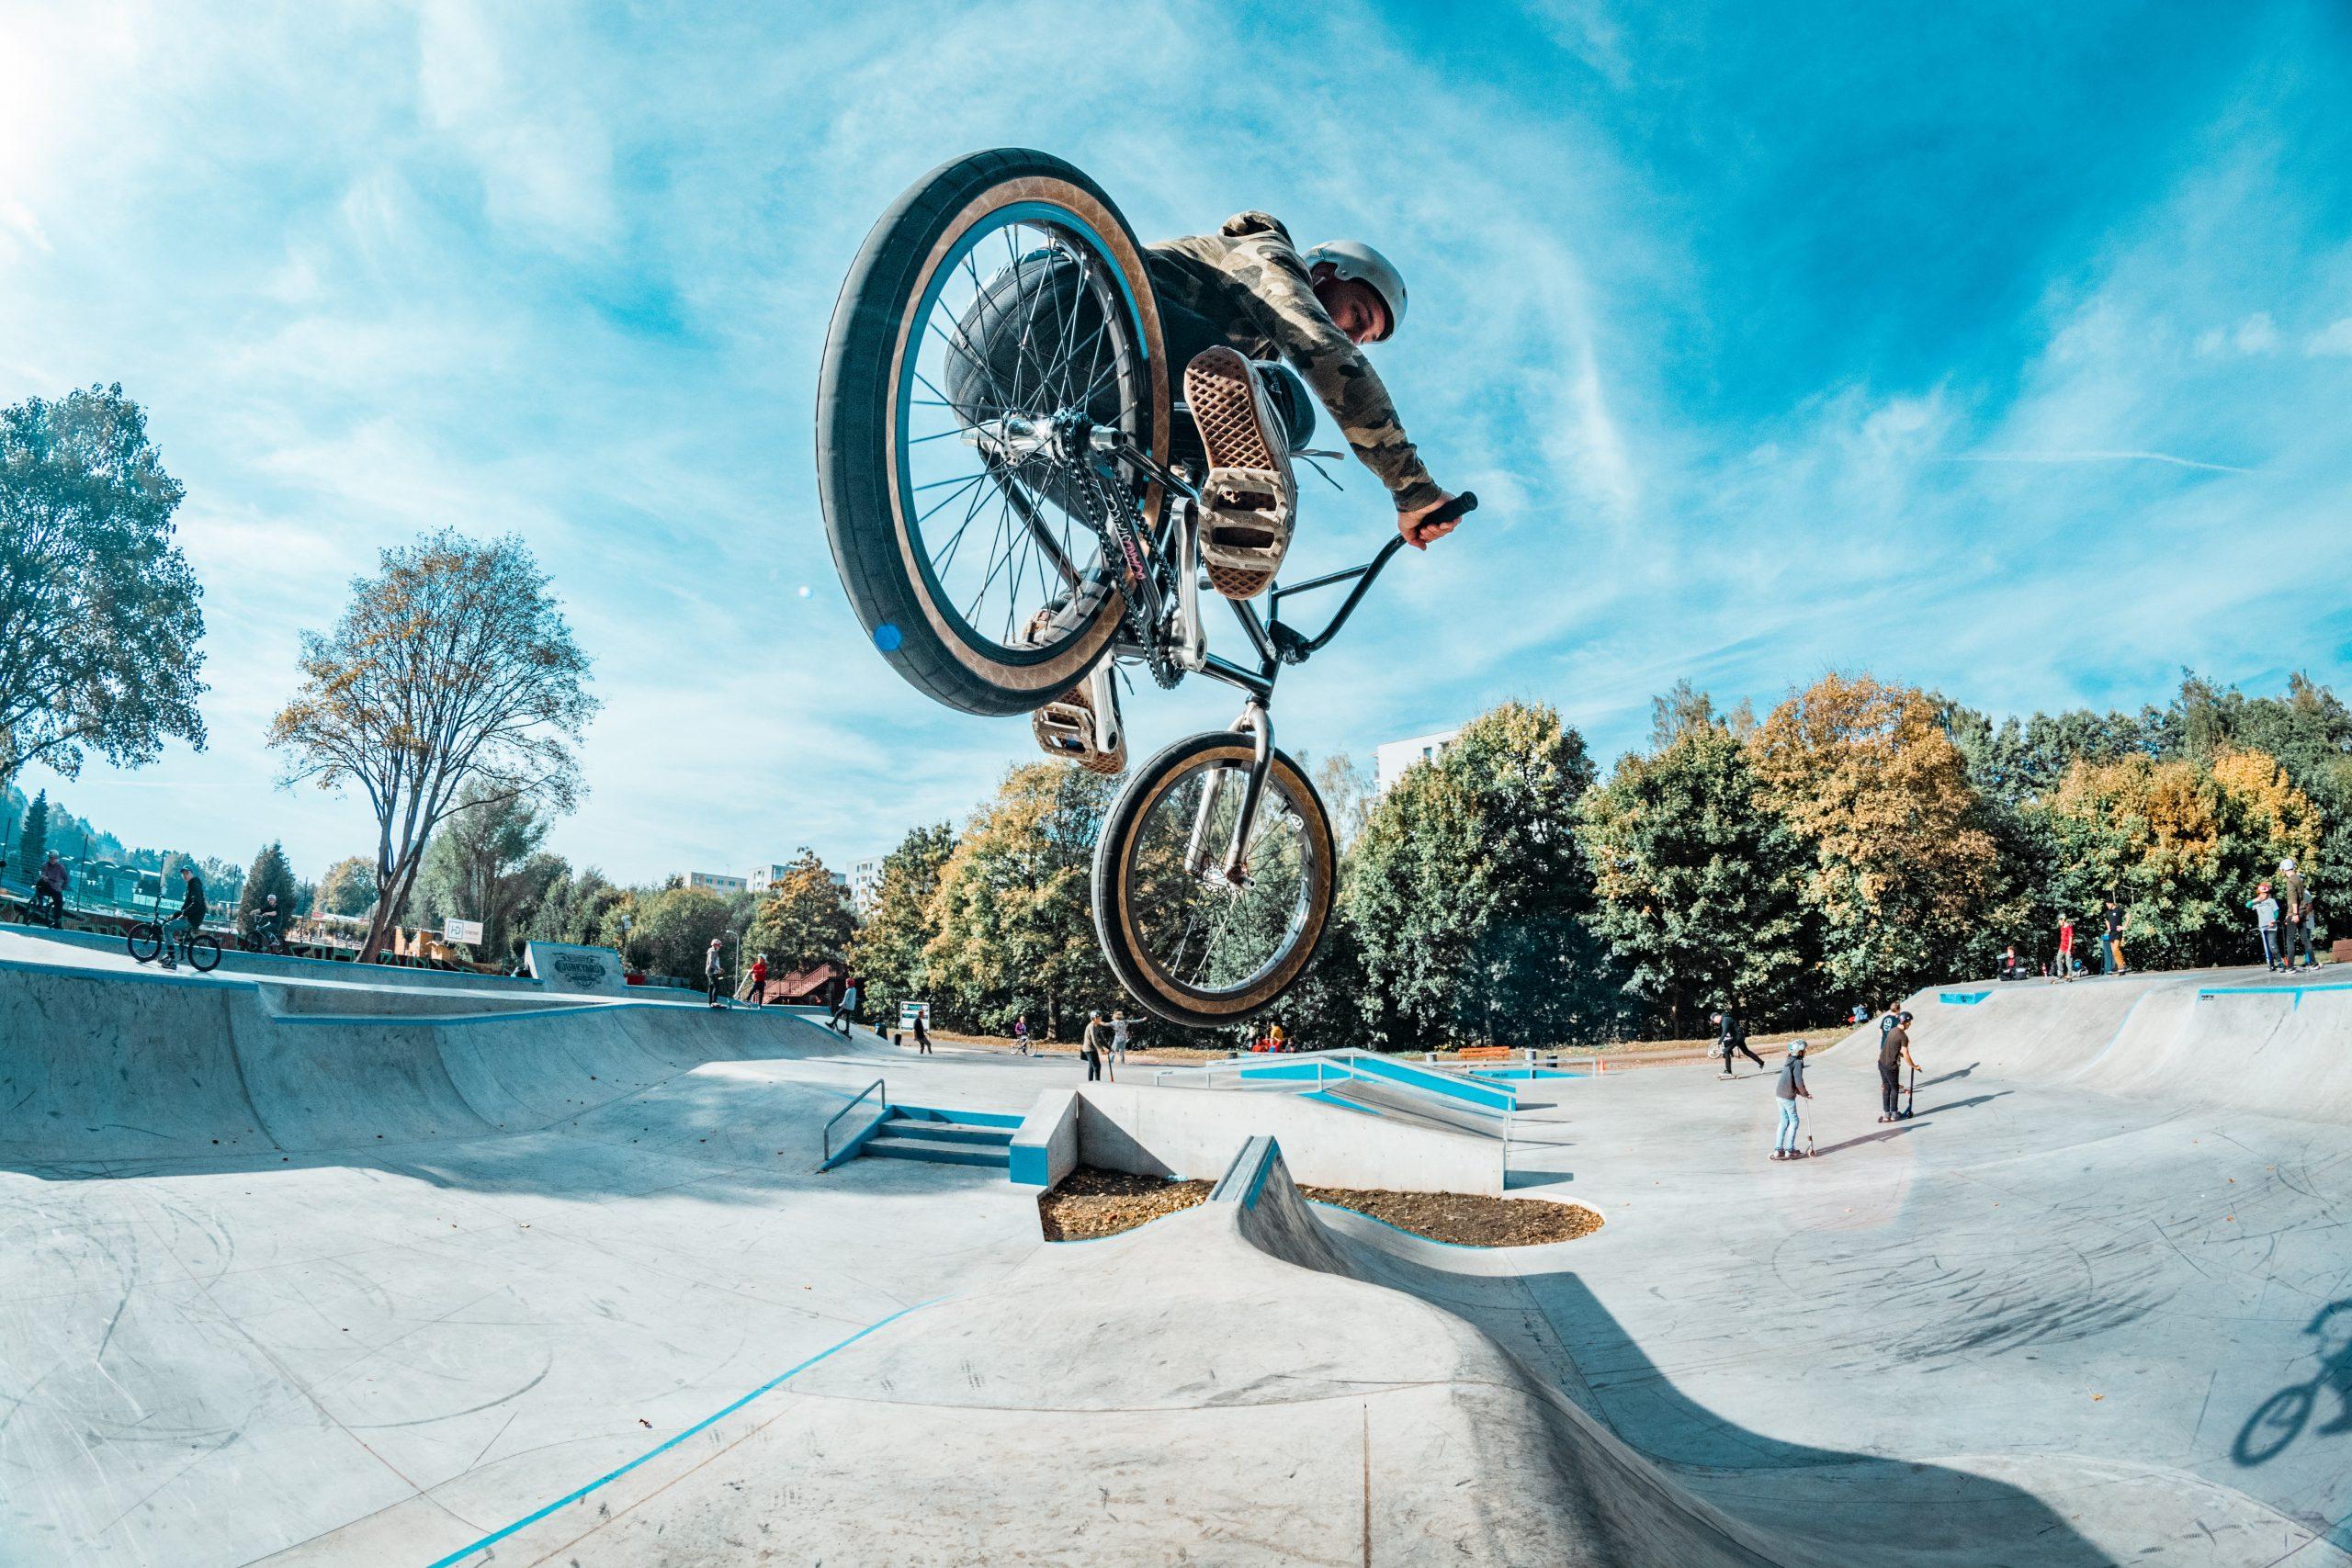 chico en parque de skate con bmx